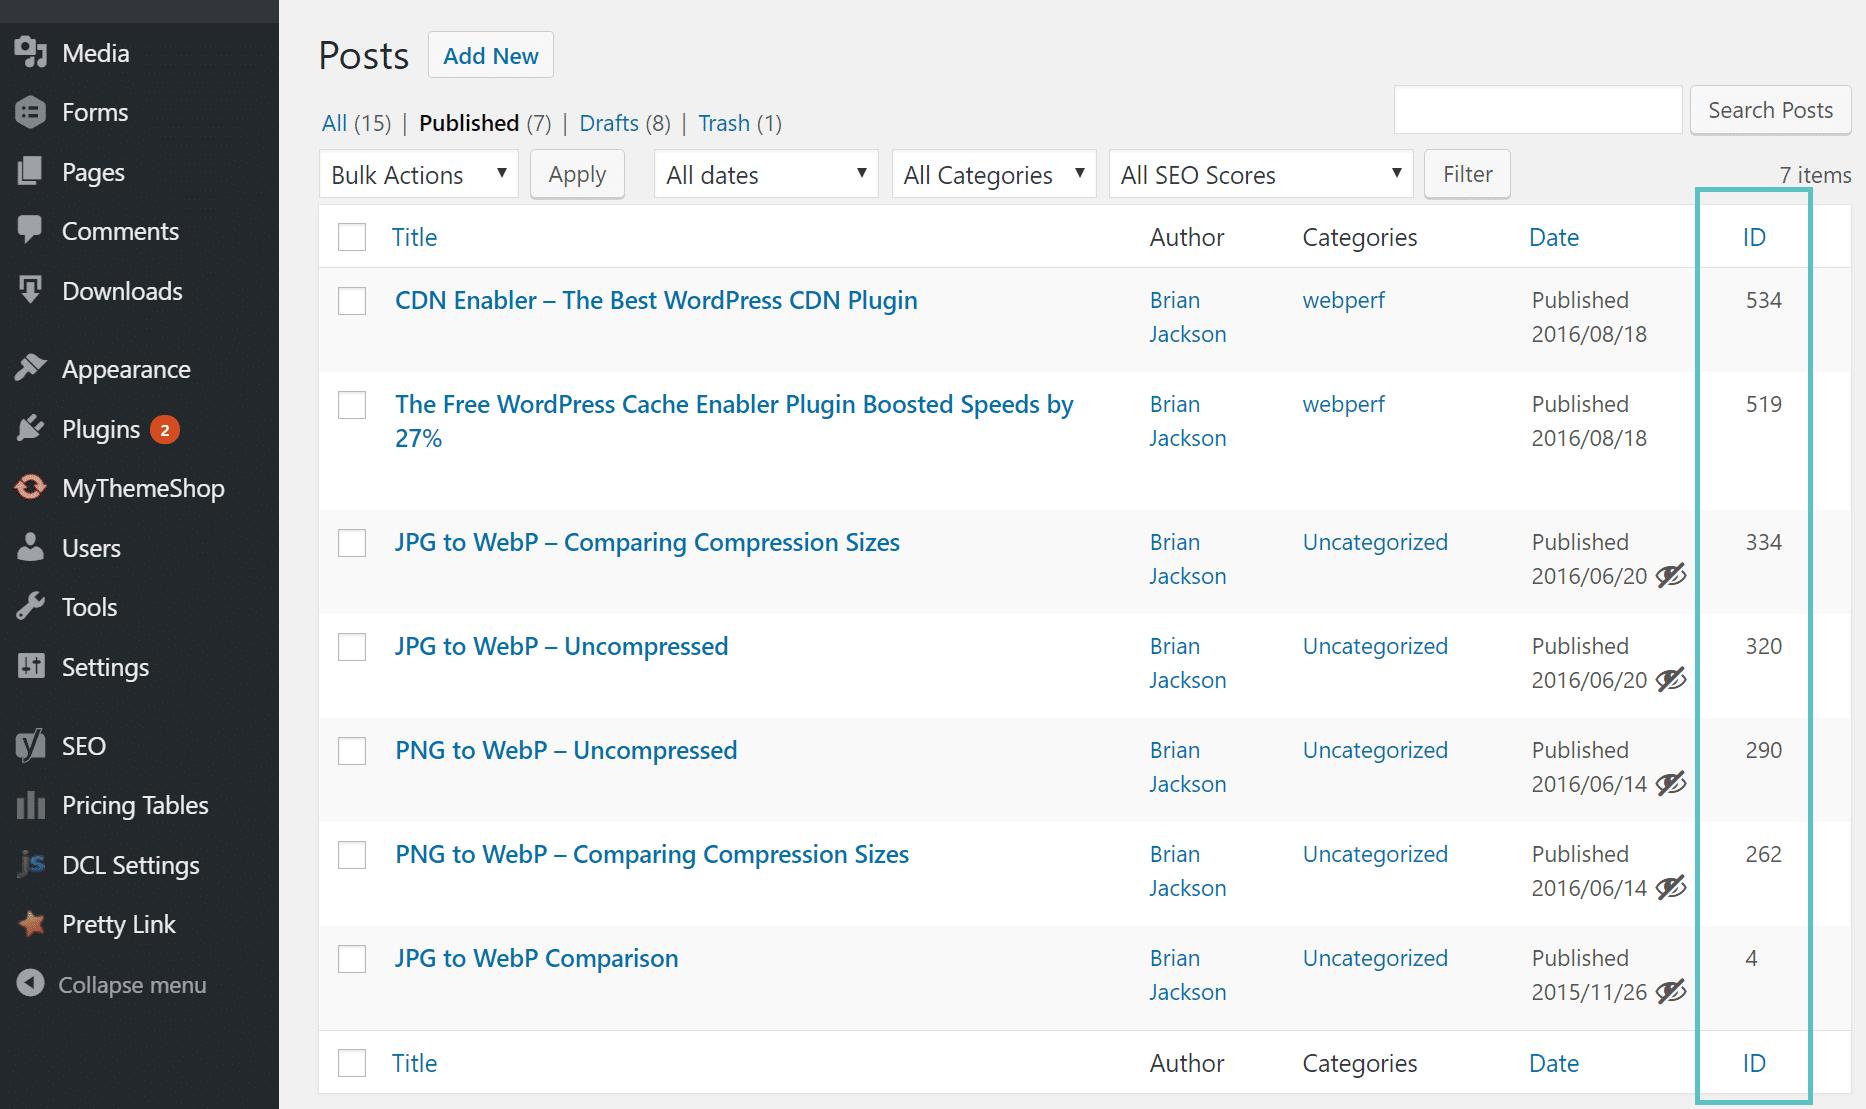 show post id in wordpress dashboard